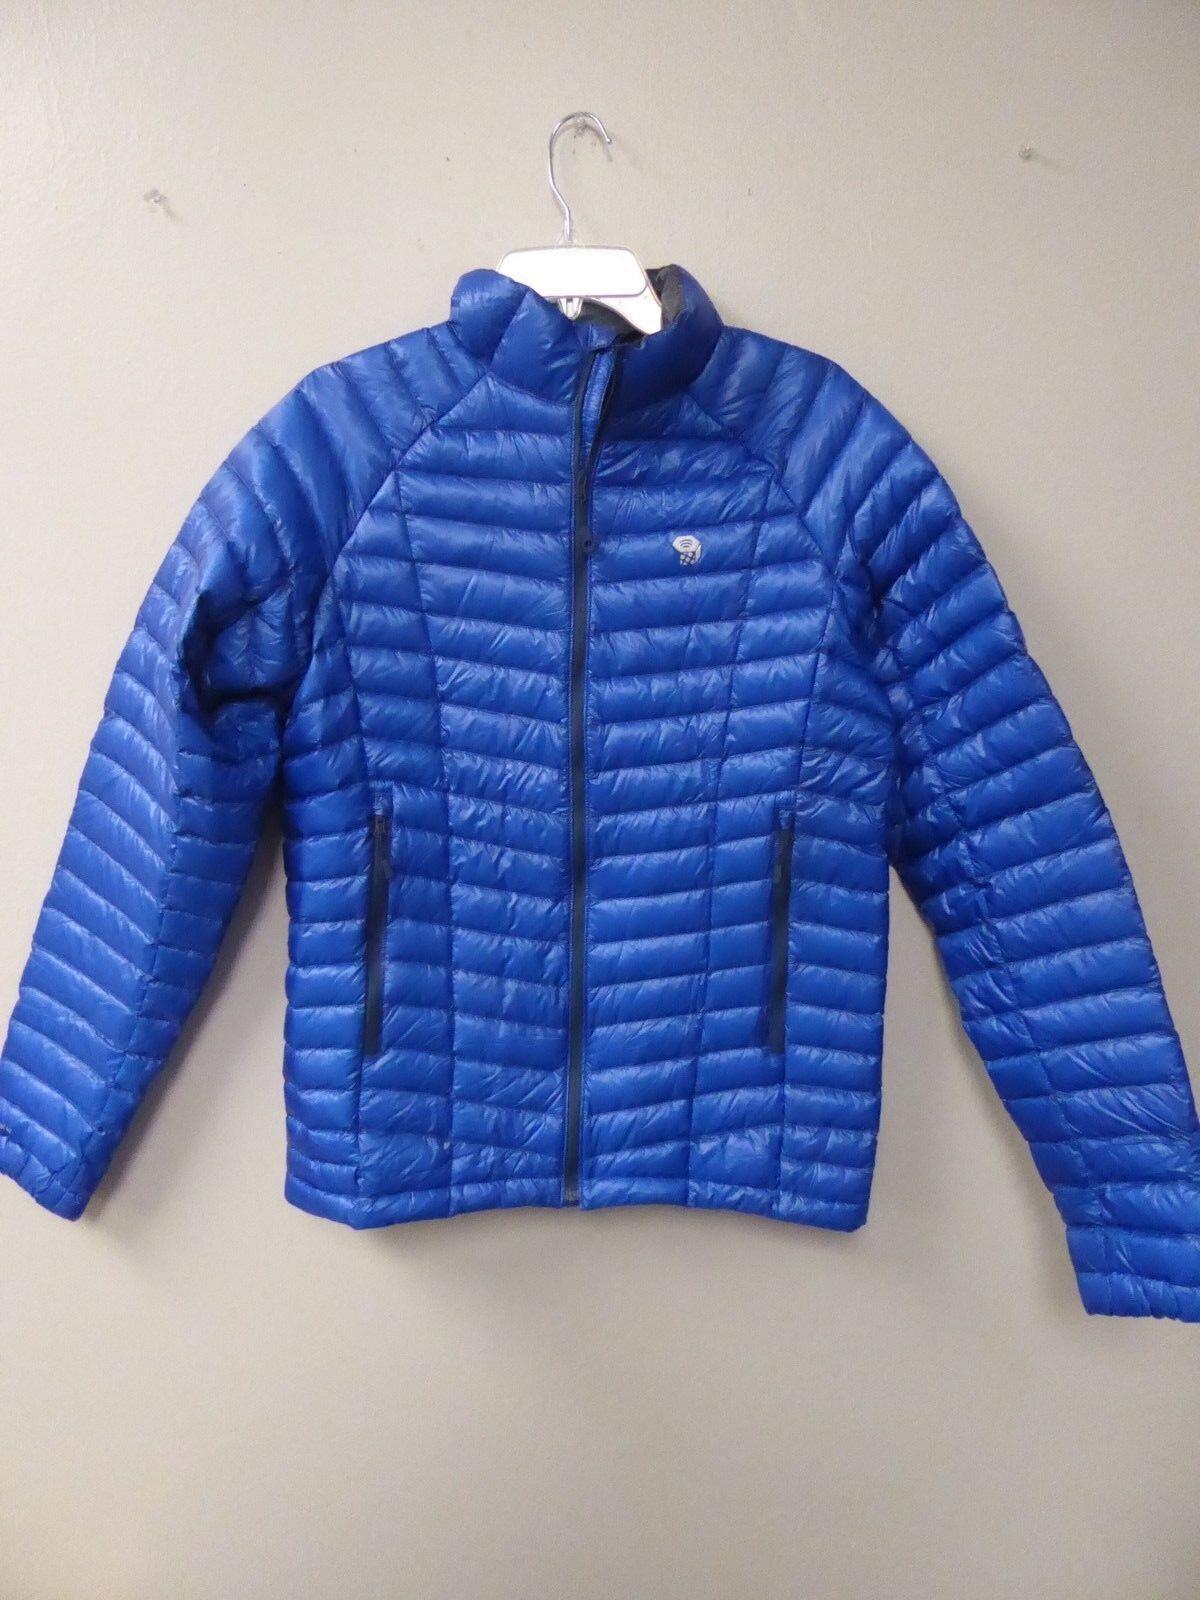 40 Jahre Mountain Equipmet Lightline Jacket